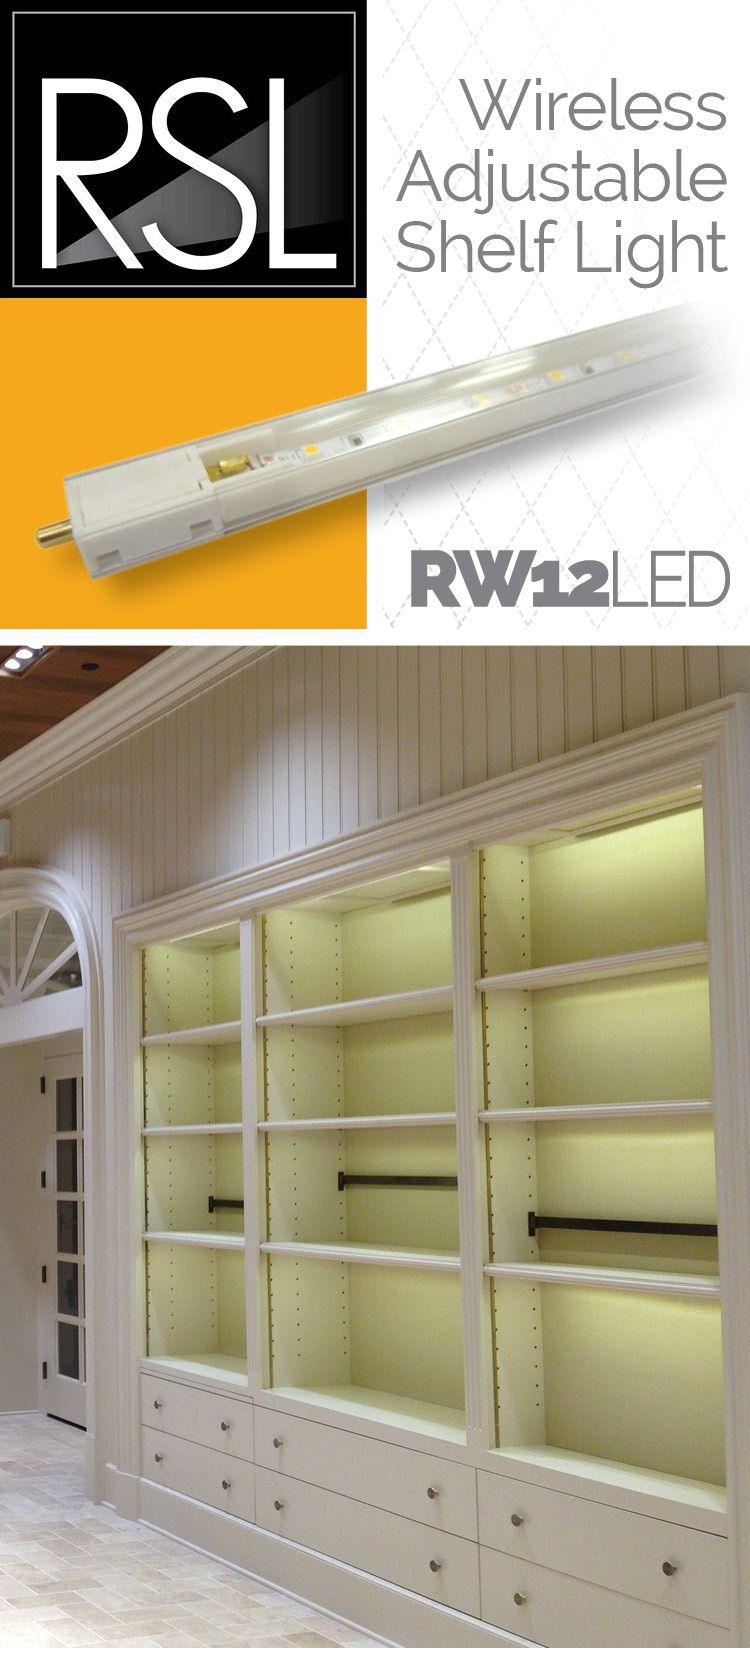 wireless lighting solutions. Wireless Adjustable Shelf Light By RSL. Robertssteplite.com Great LED Lighting Solution For Retail Solutions G